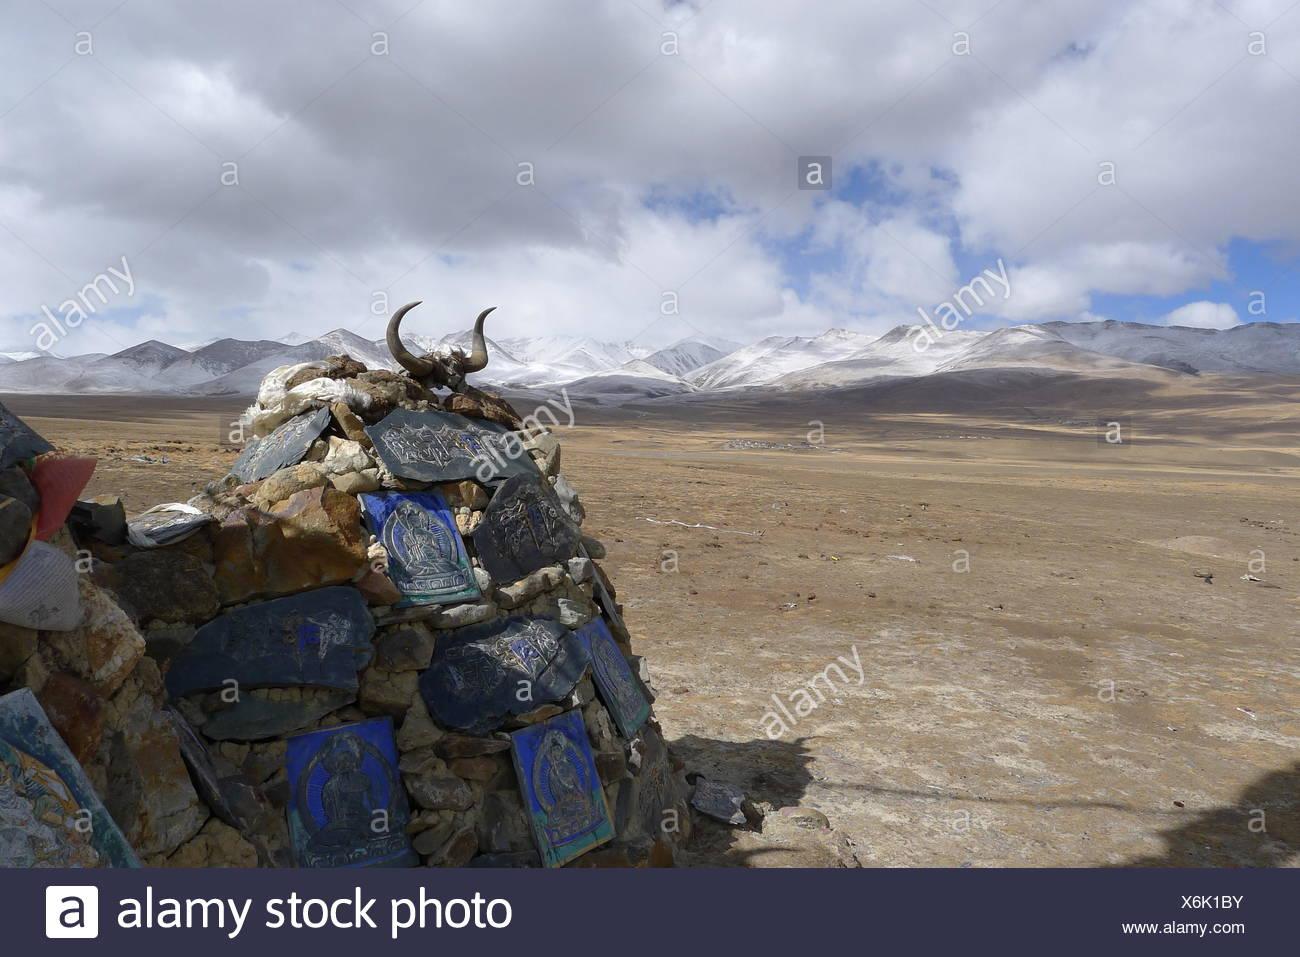 Religious shrine, Tibet, China - Stock Image